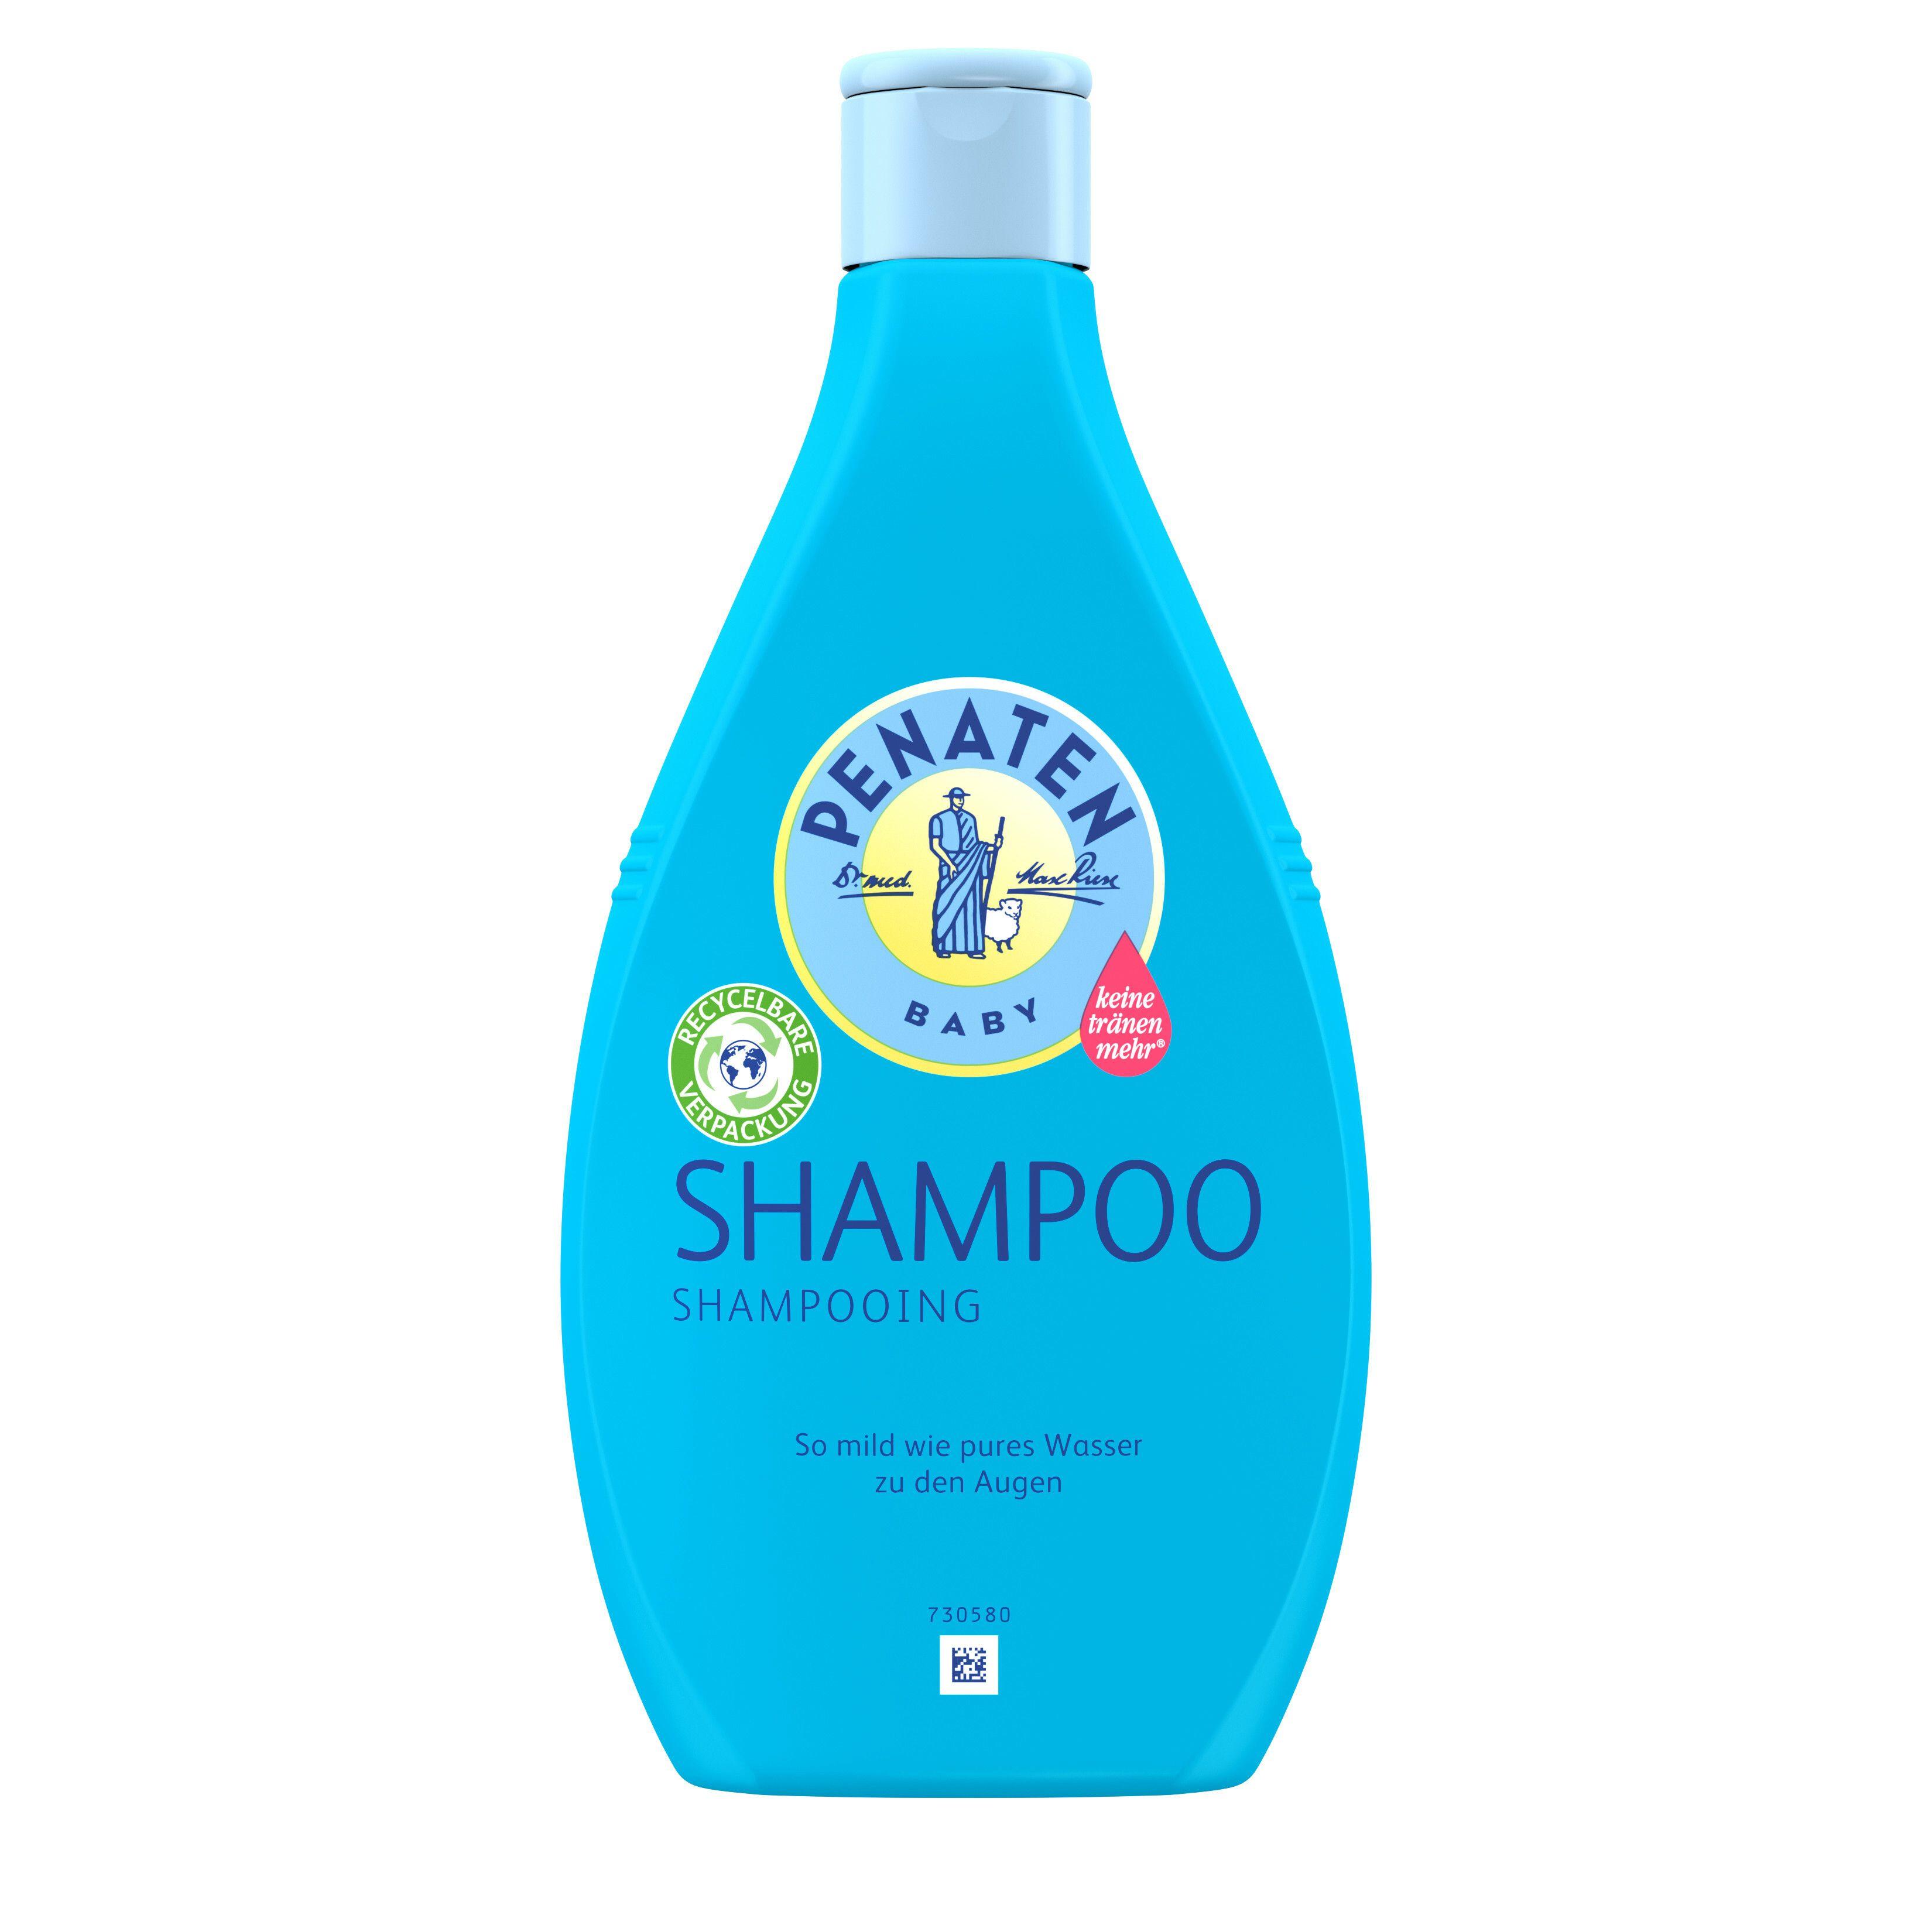 Image of PENATEN® BABY Shampoo